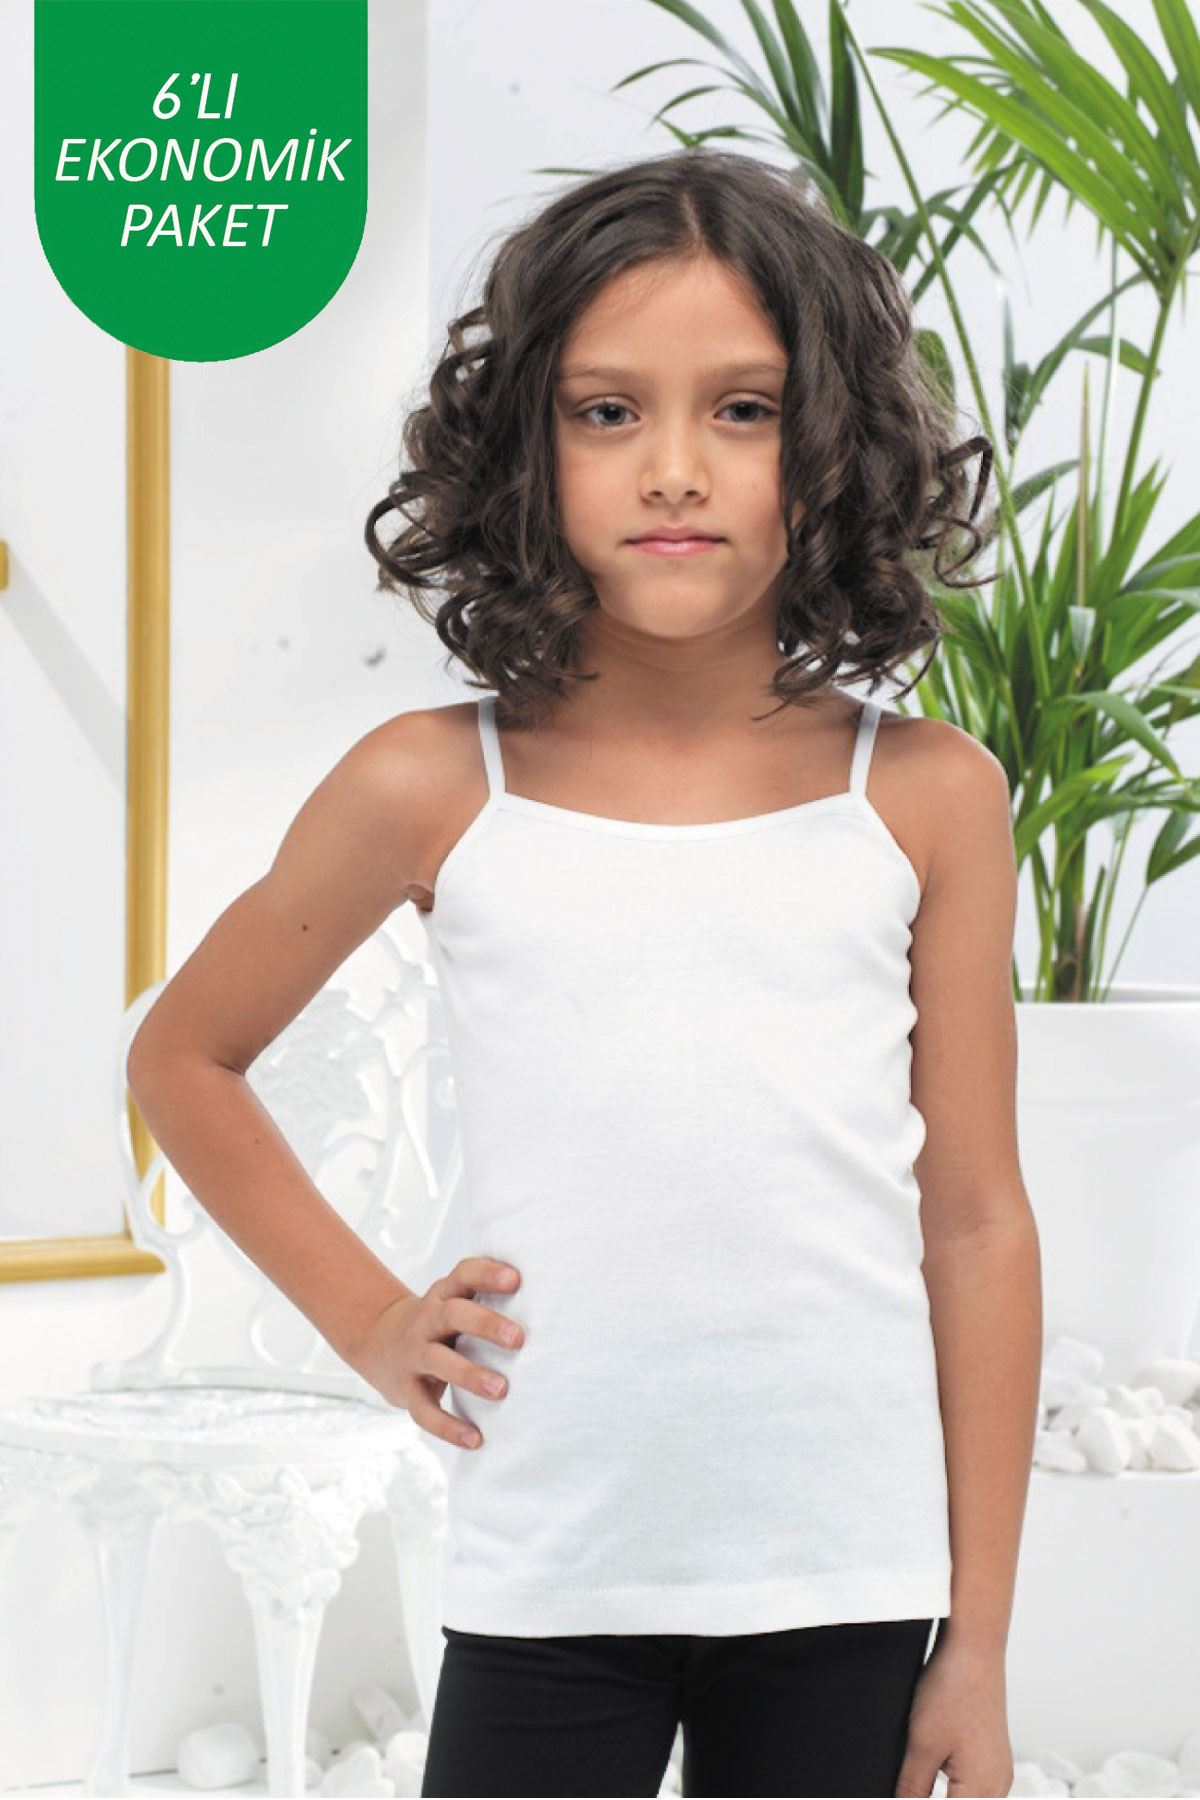 Beyaz Kız Çocuk 6 lı Paket E Serisi İp Askılı Ribana Atlet 315 - E